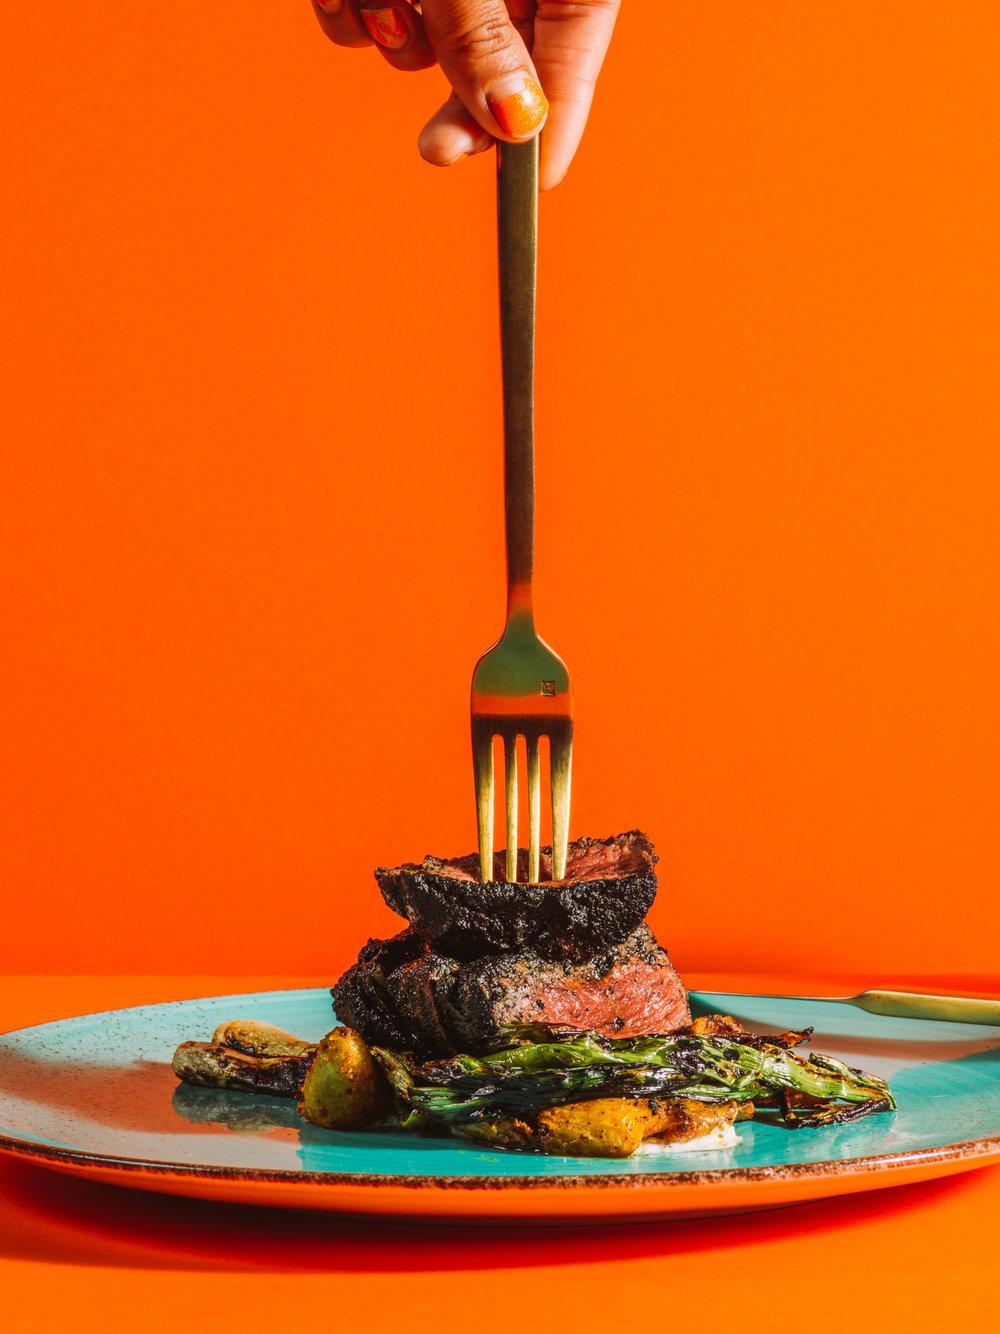 Nick-Johnson-Food-Photography-Rice-and-Gold--19.JPG